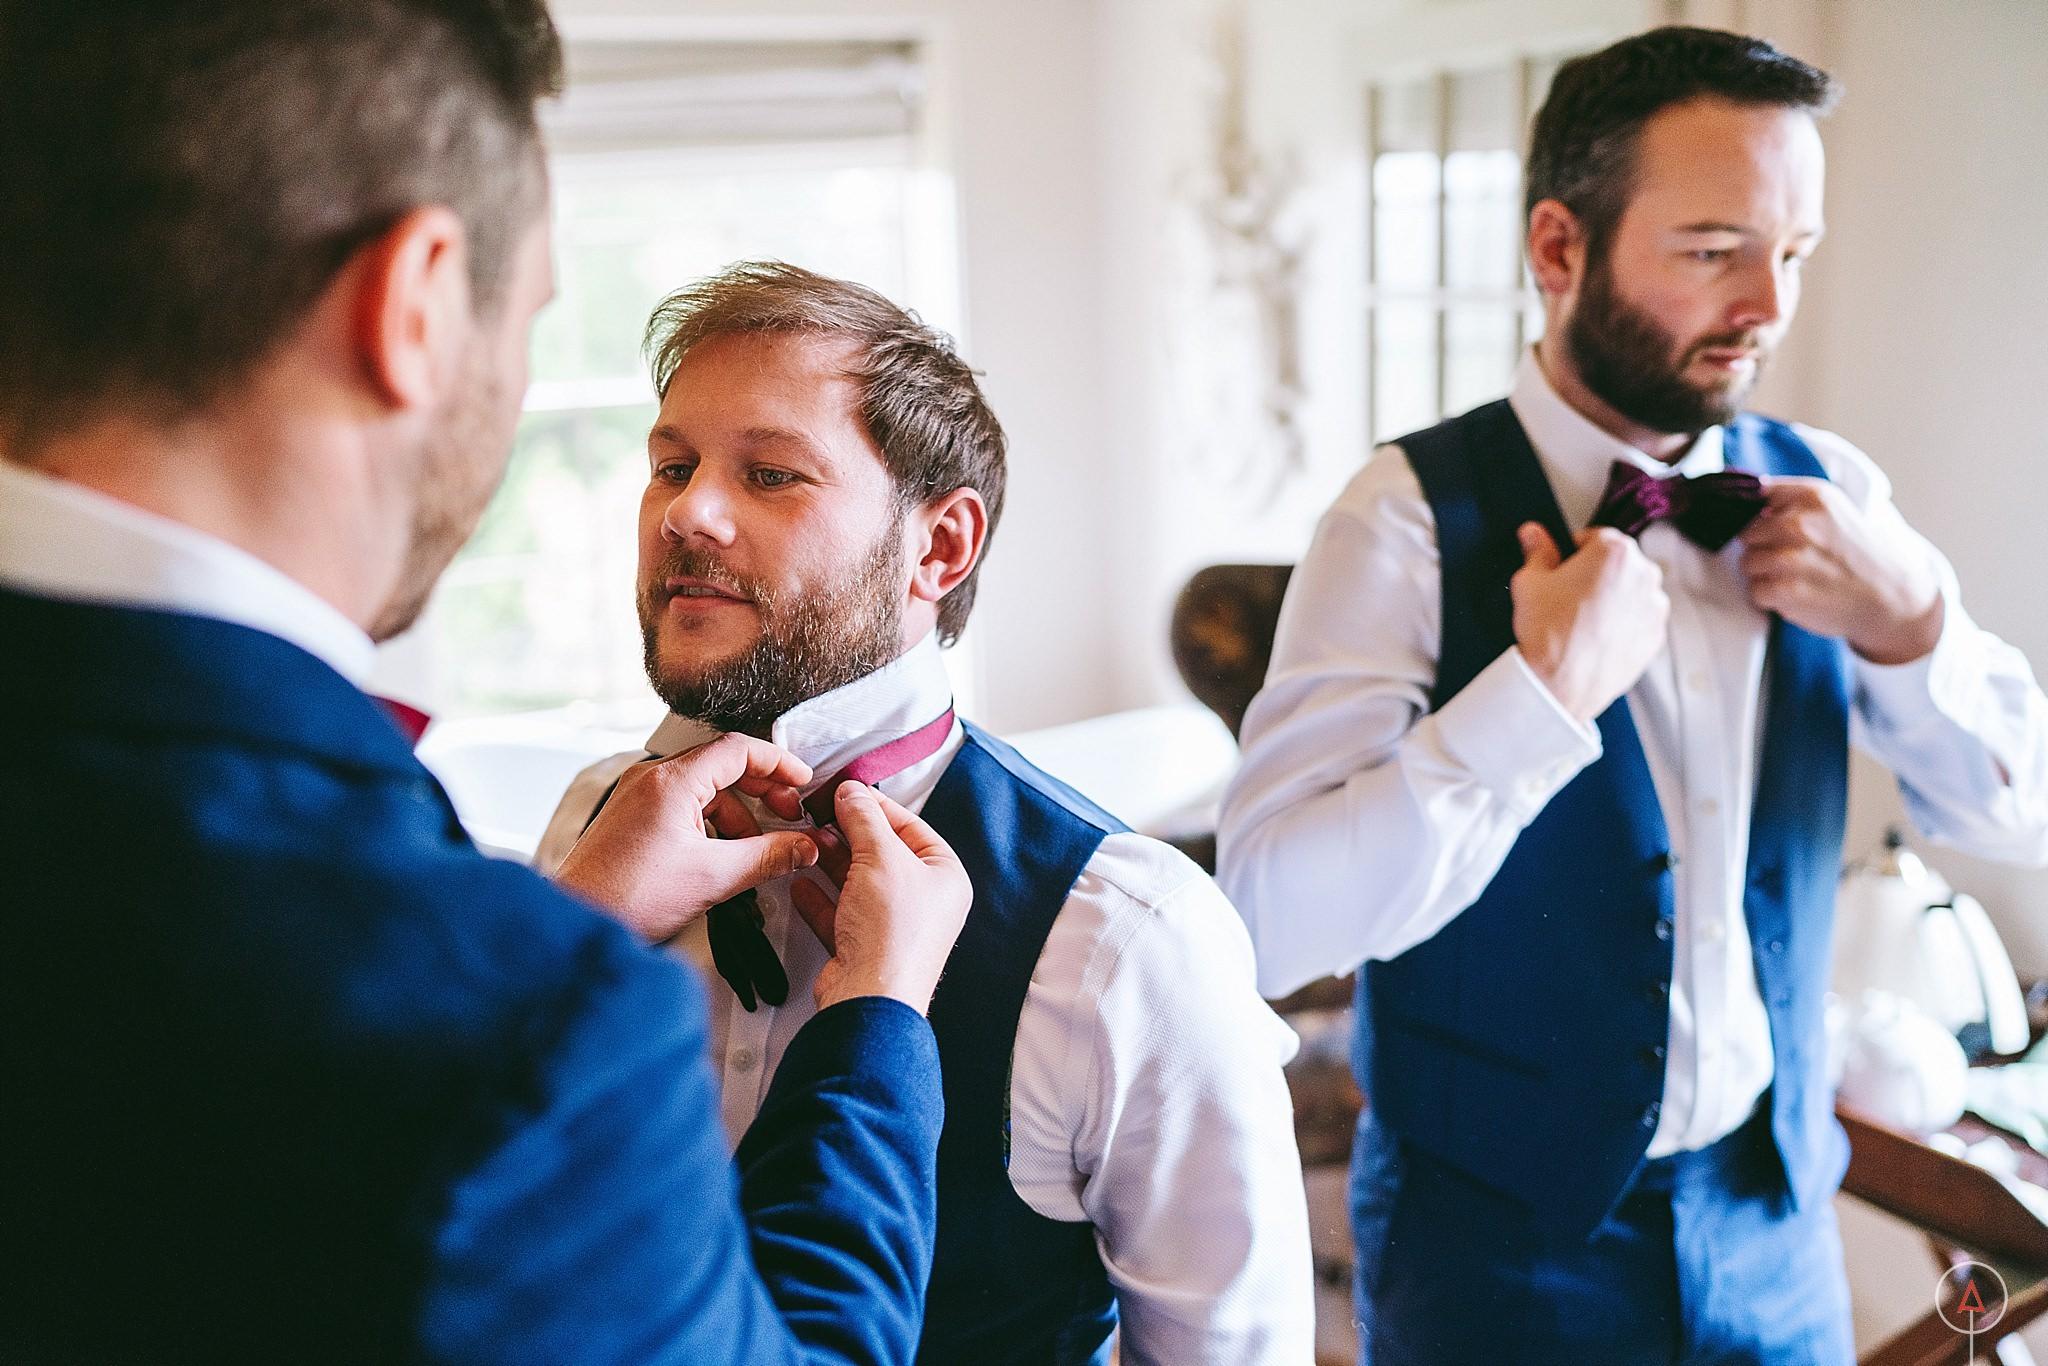 cardiff-wedding-photographer-aga-tomaszek_0228